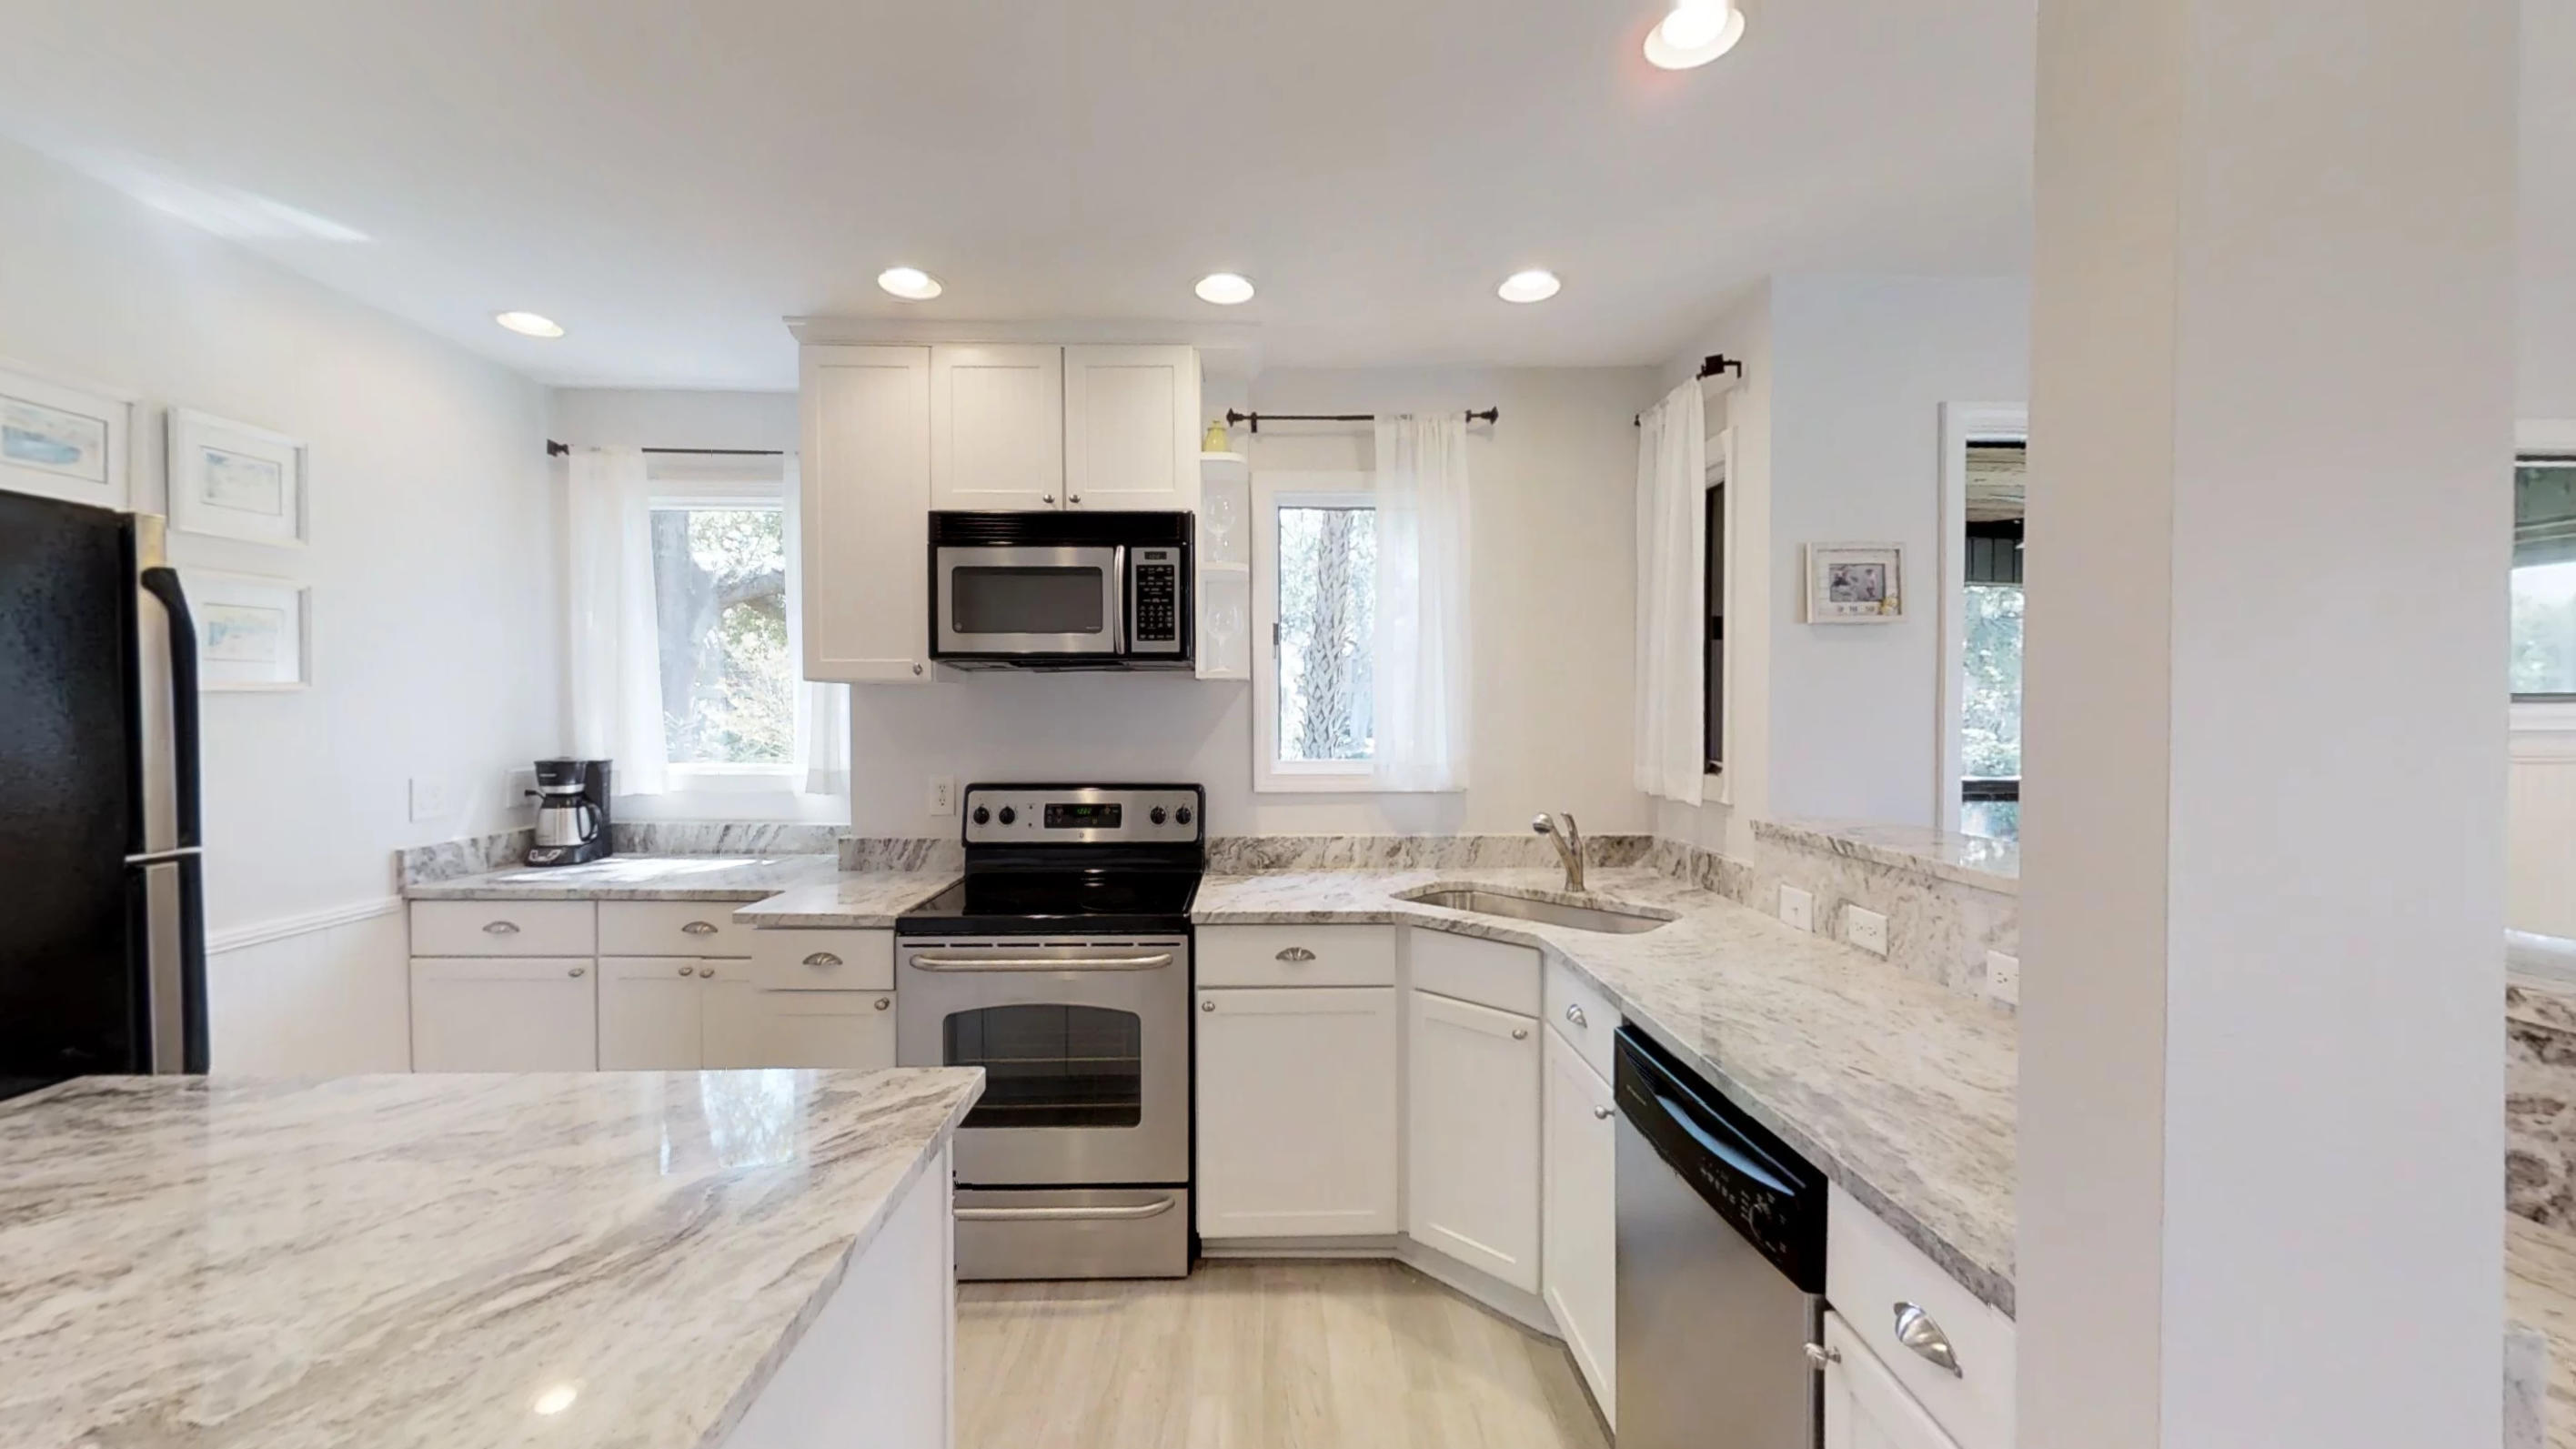 Kiawah Island Homes For Sale - 4511 Park Lake, Kiawah Island, SC - 9